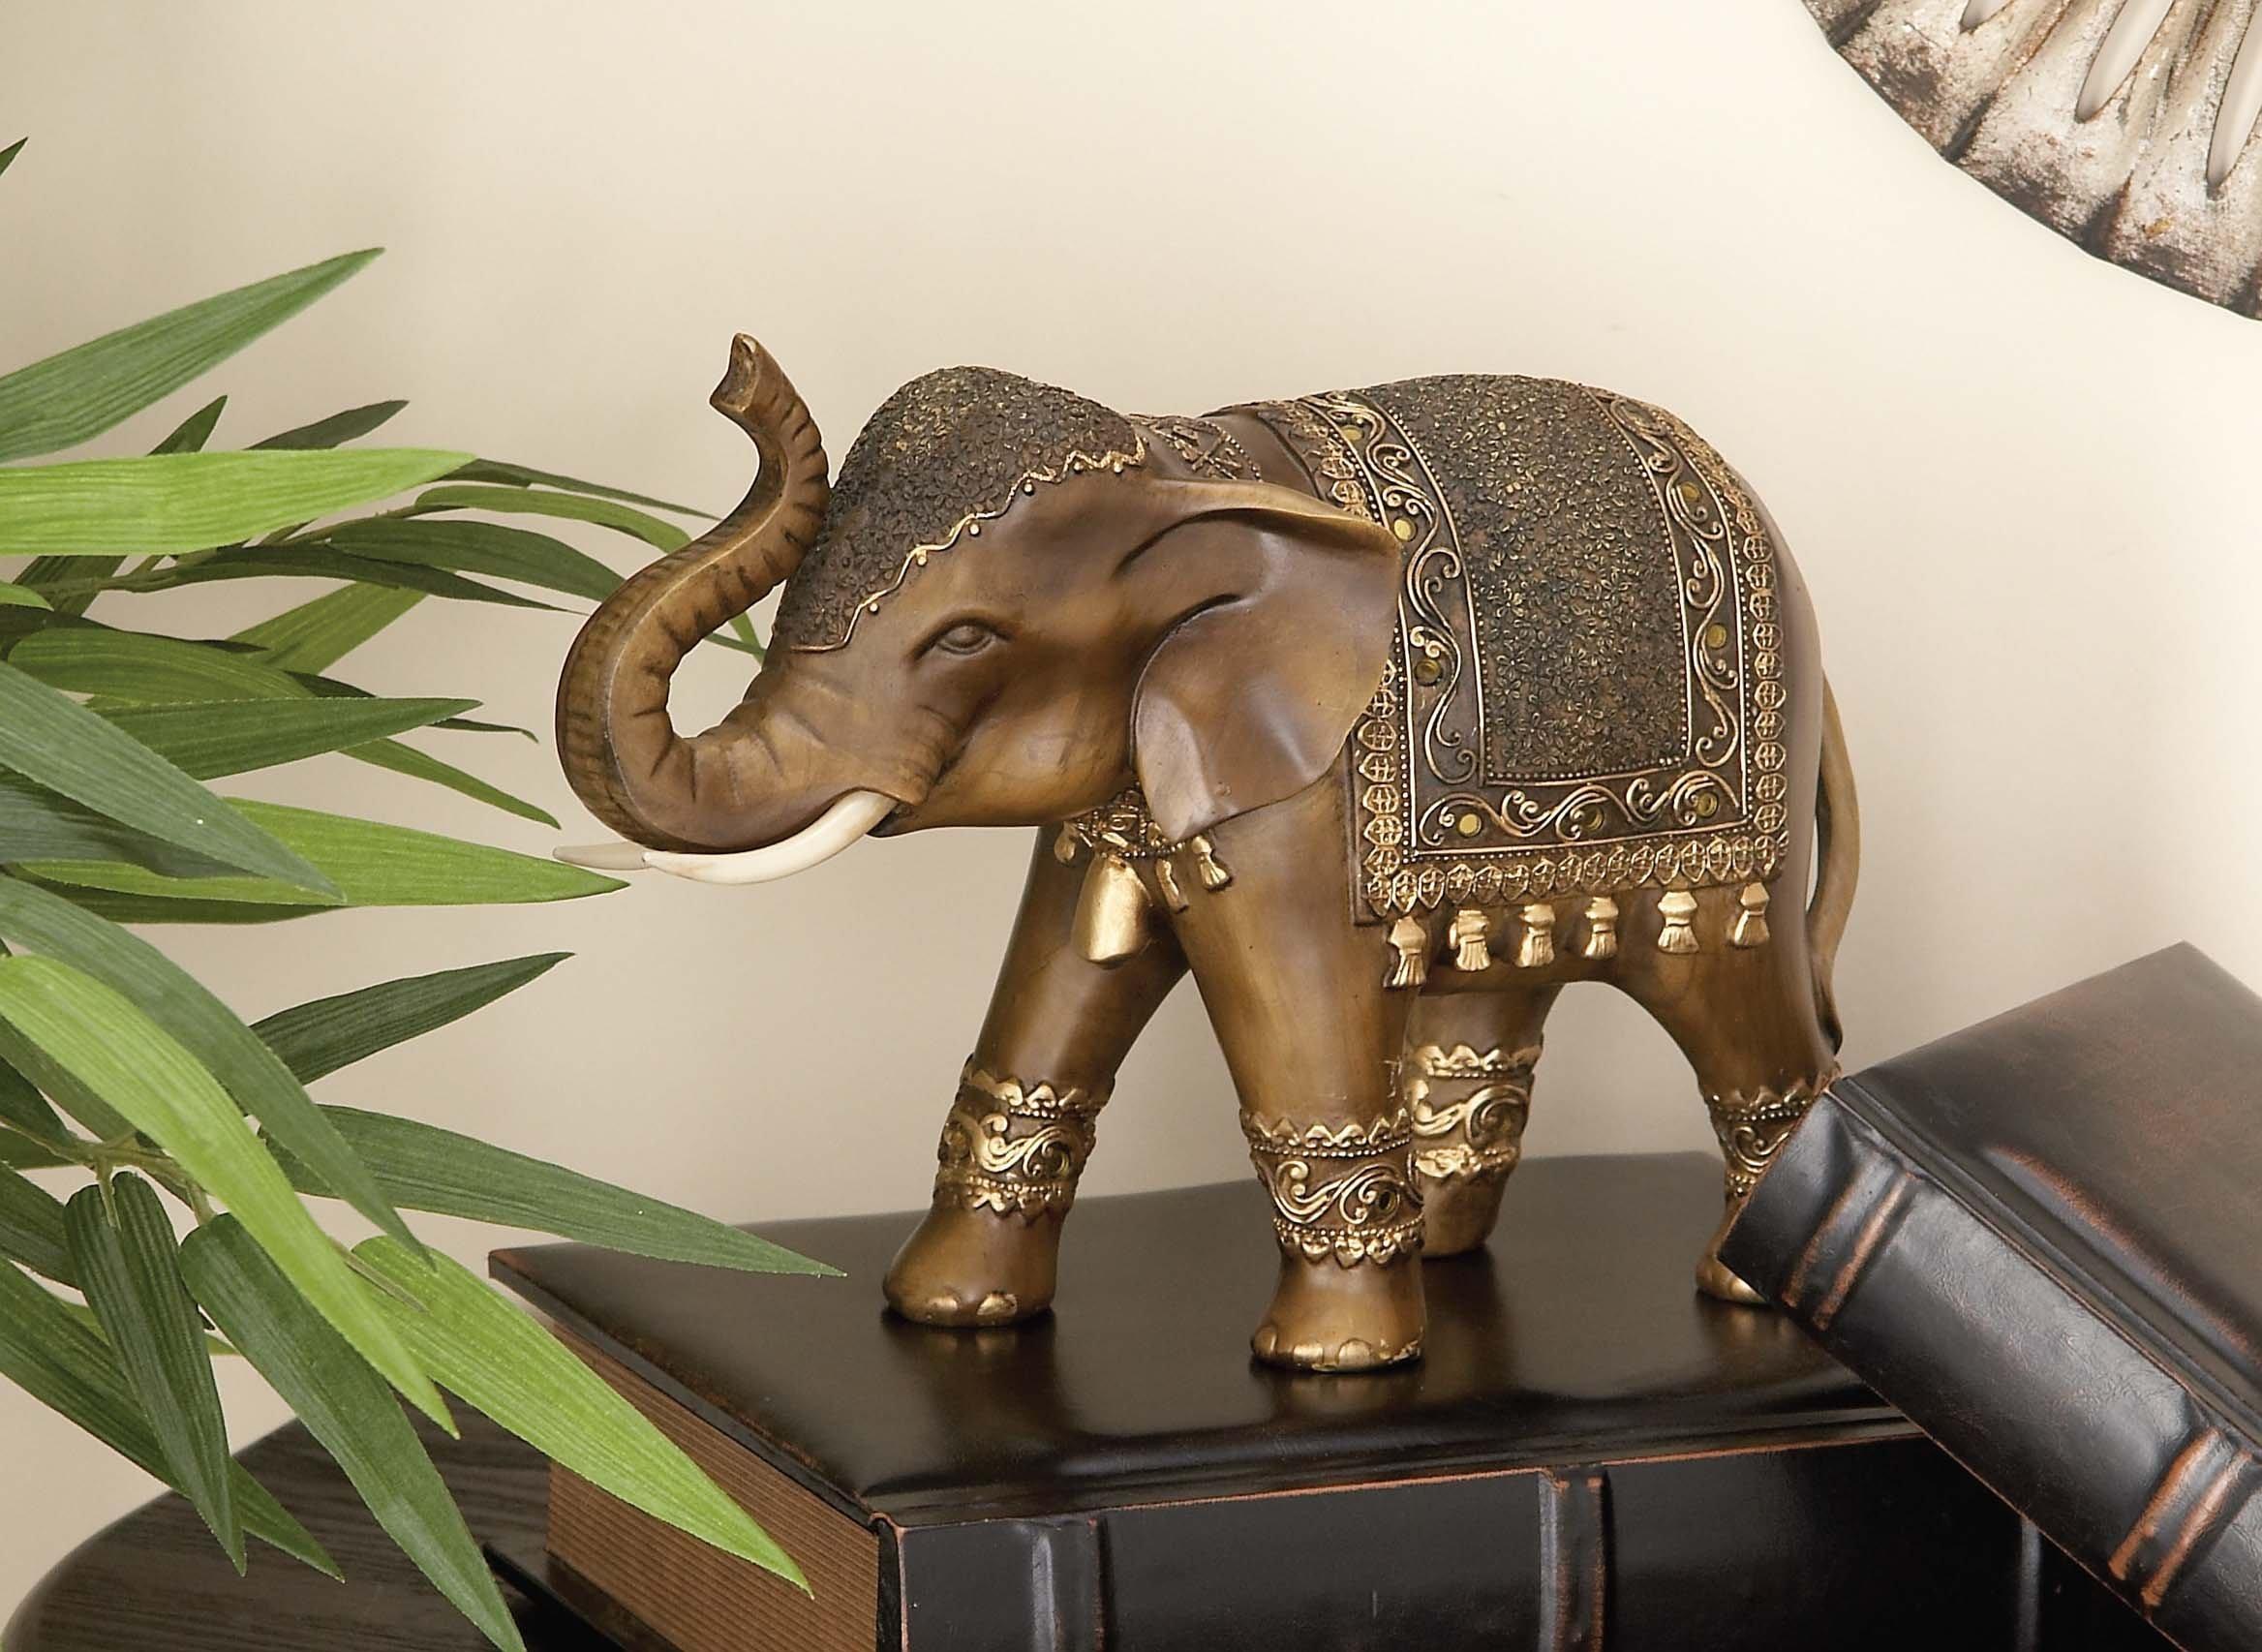 Deco 79 Polystone Elephant, 11 by 8-Inch by Deco 79 (Image #6)